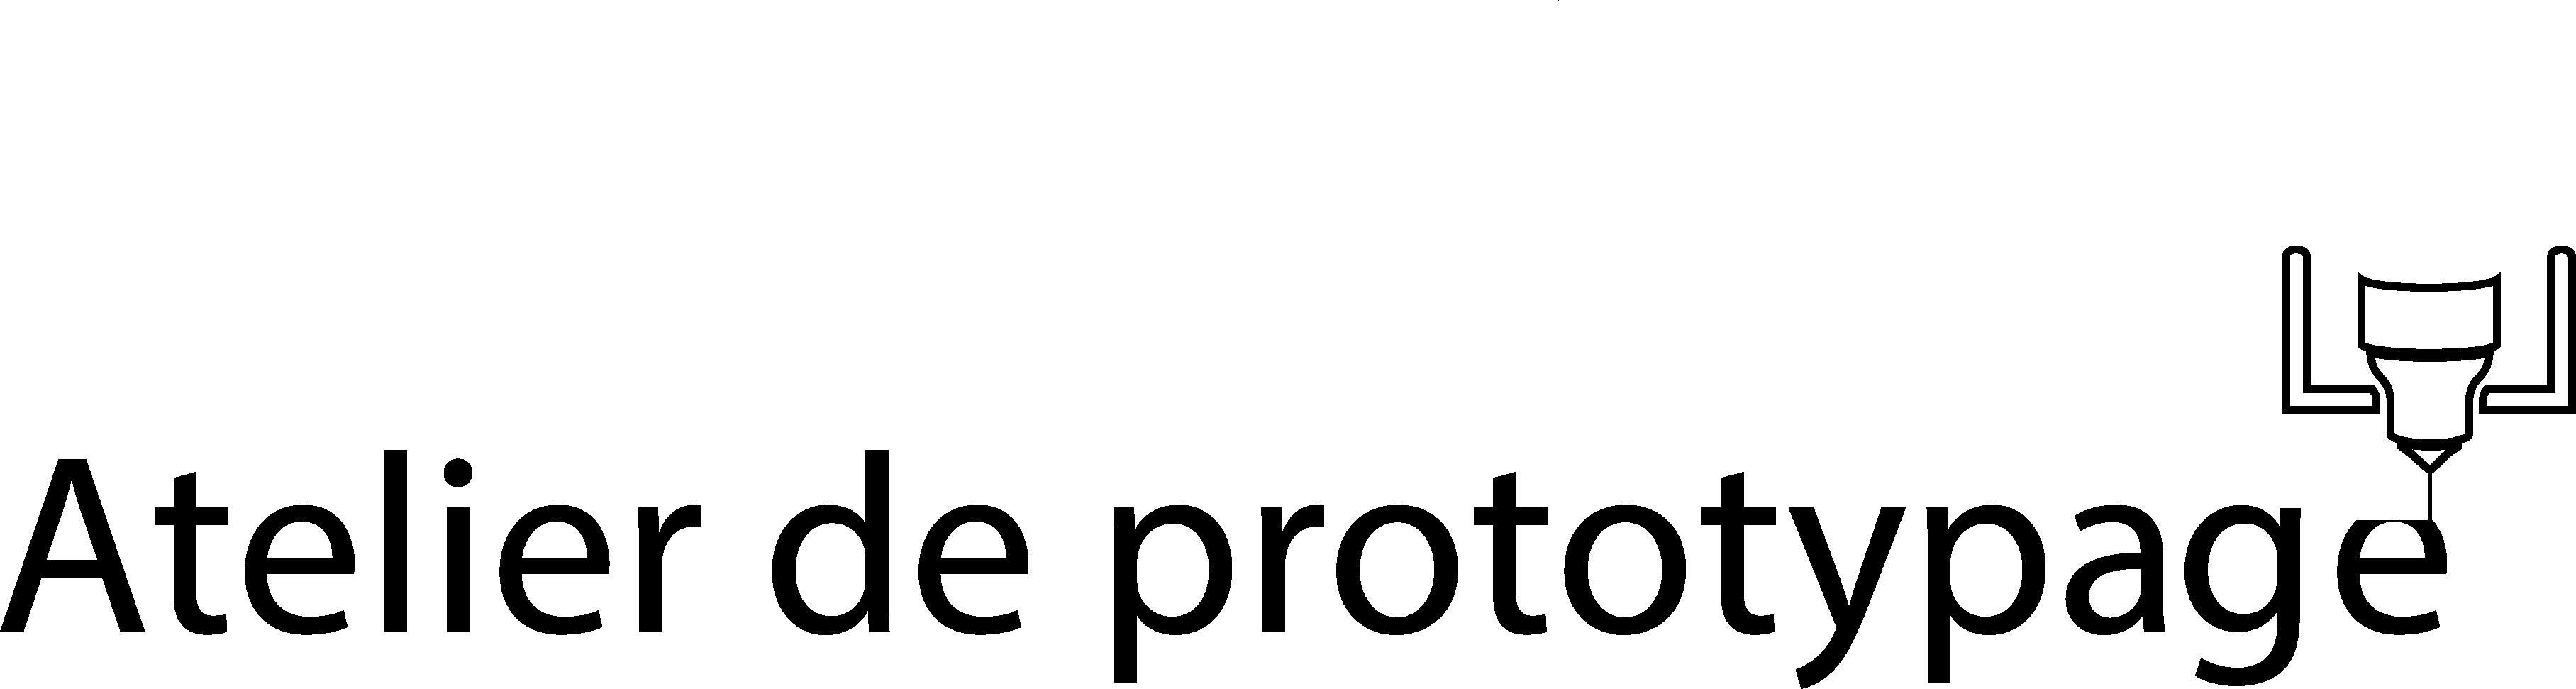 logo atelier de prototypage